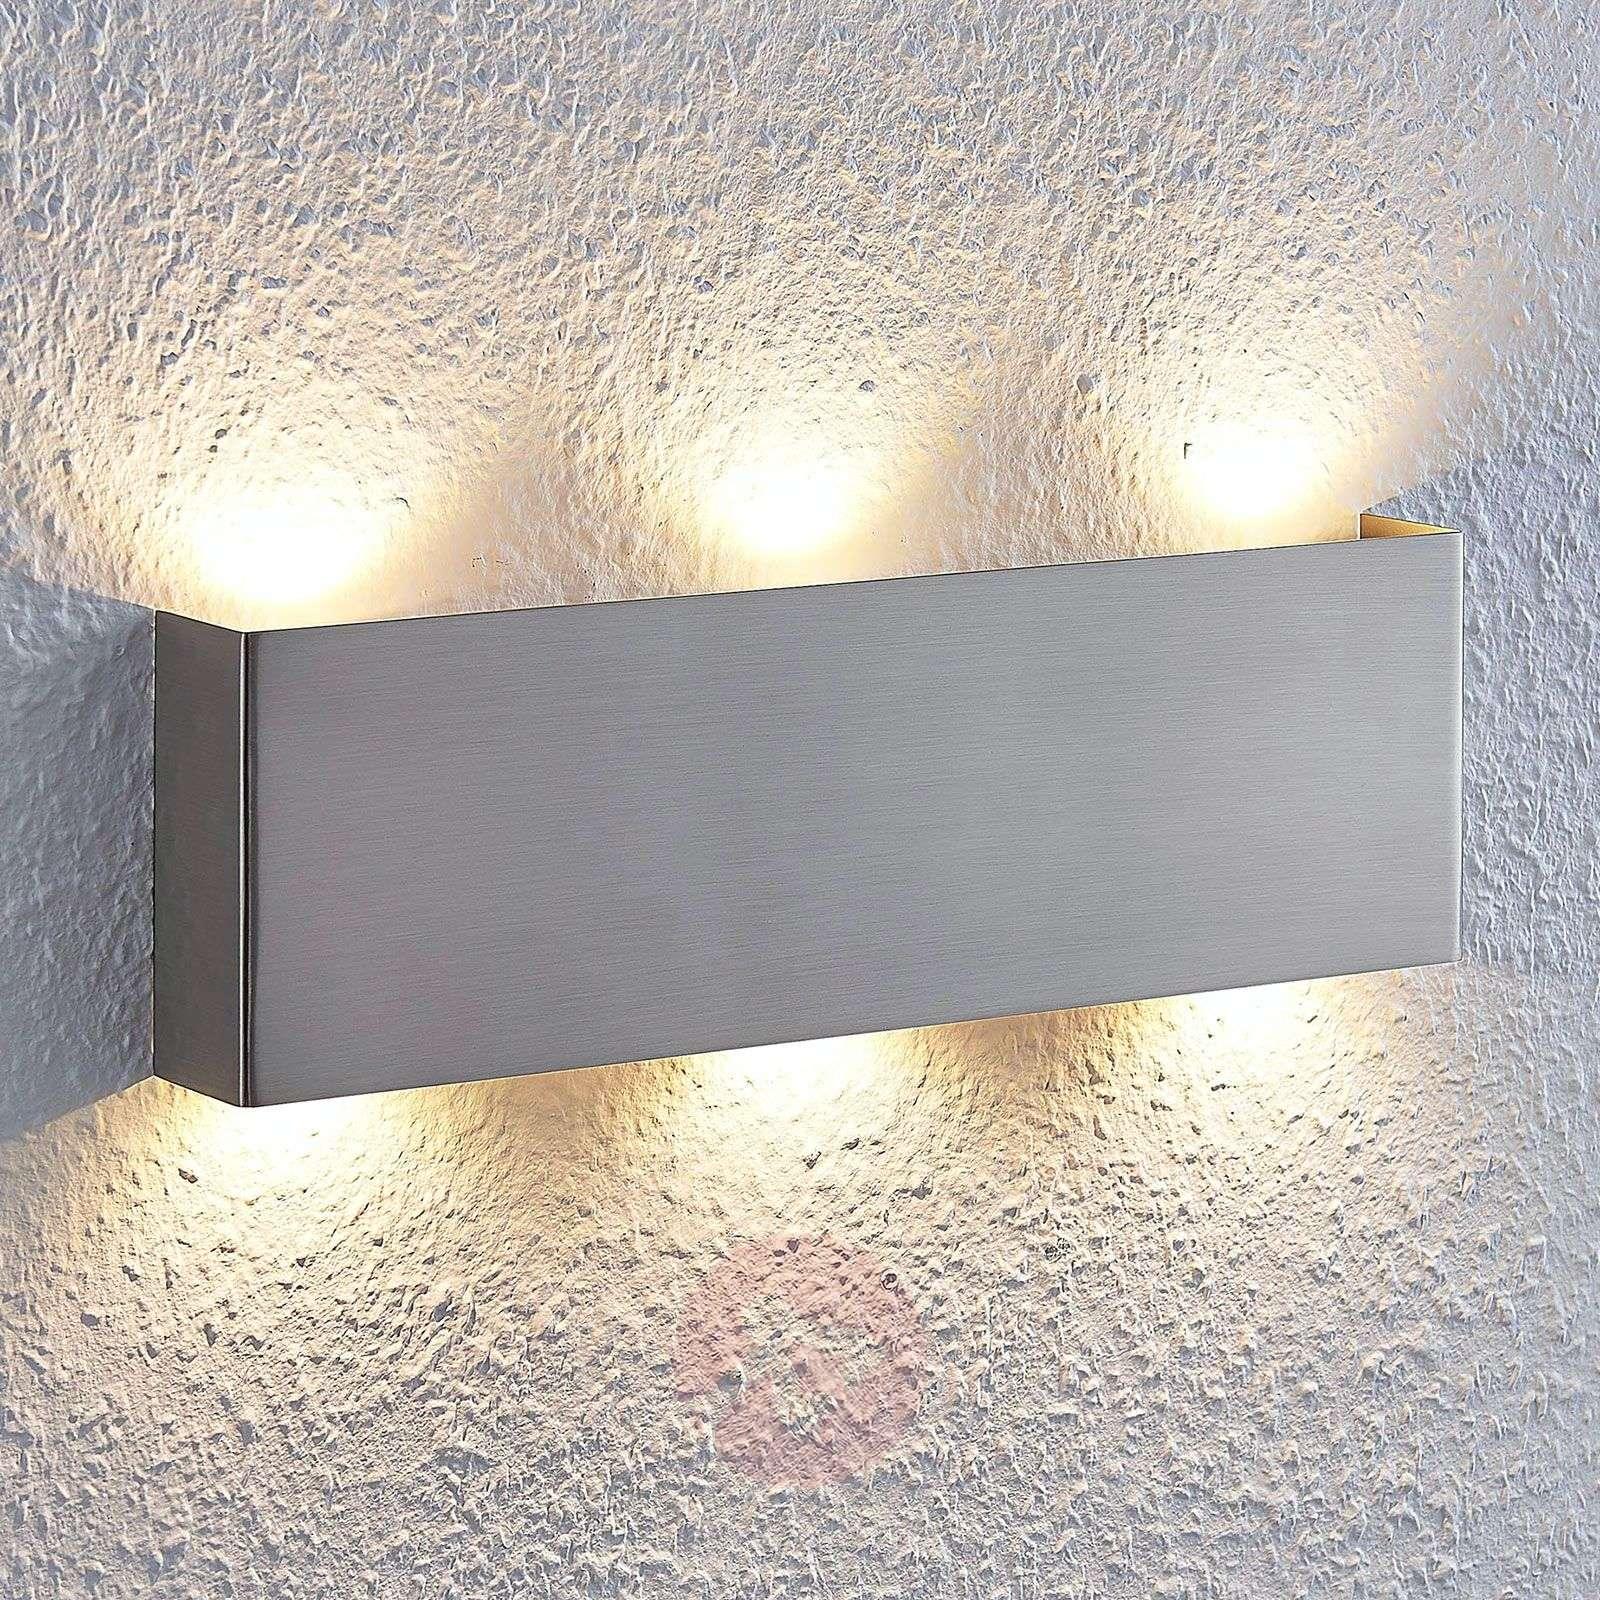 Sierstrip Chroom Badkamer : Led wall light manon satin nickel 35 cm lights.ie